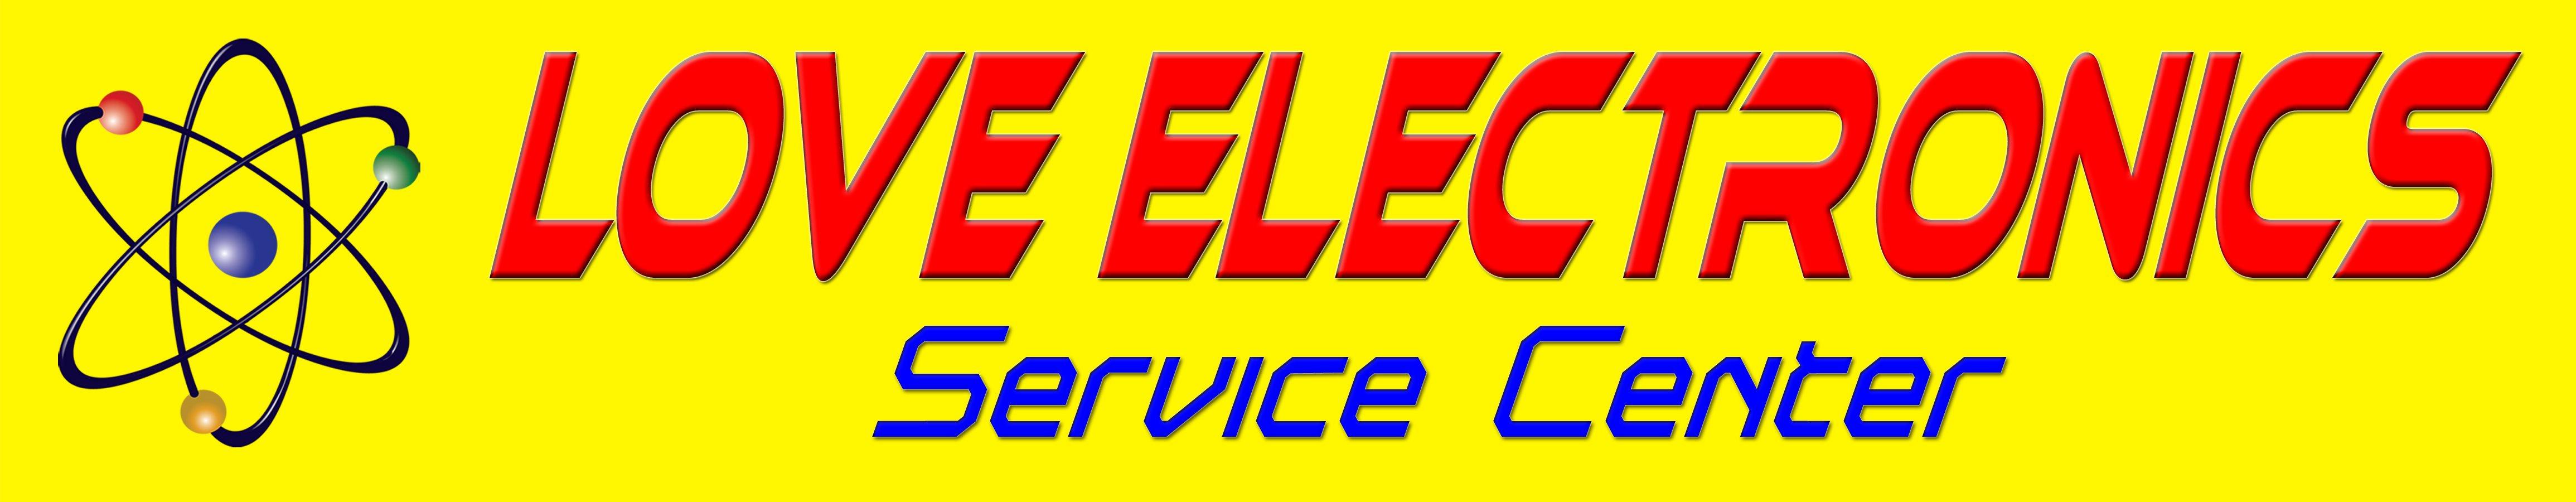 Love Electronics Service Center